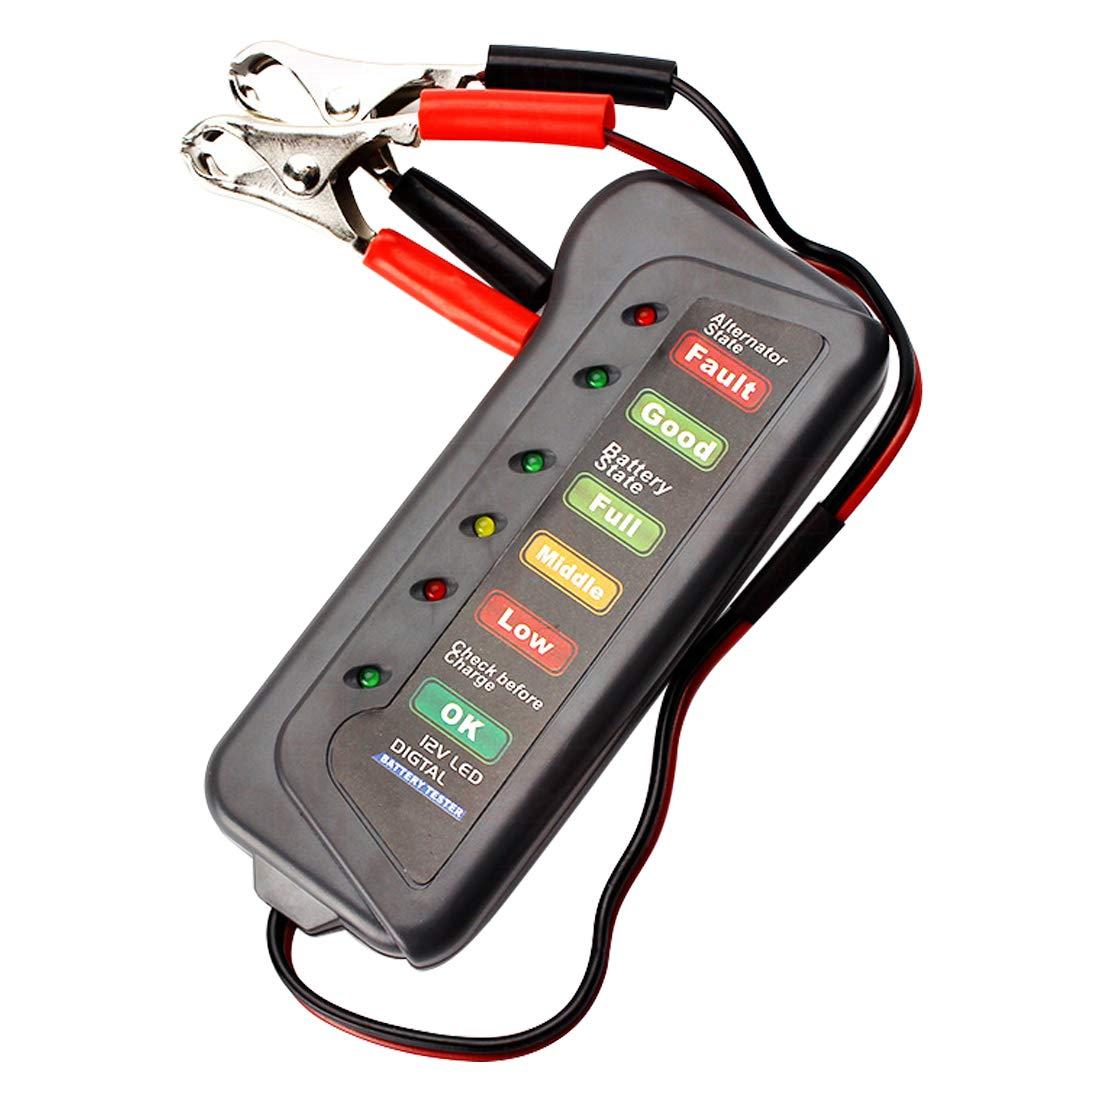 Noyokere 12V LED Bater/ía Digital probador del alternador Probador de la bater/ía Monitor de Nivel de bater/ía para Camiones de Motocicleta de autom/óvil